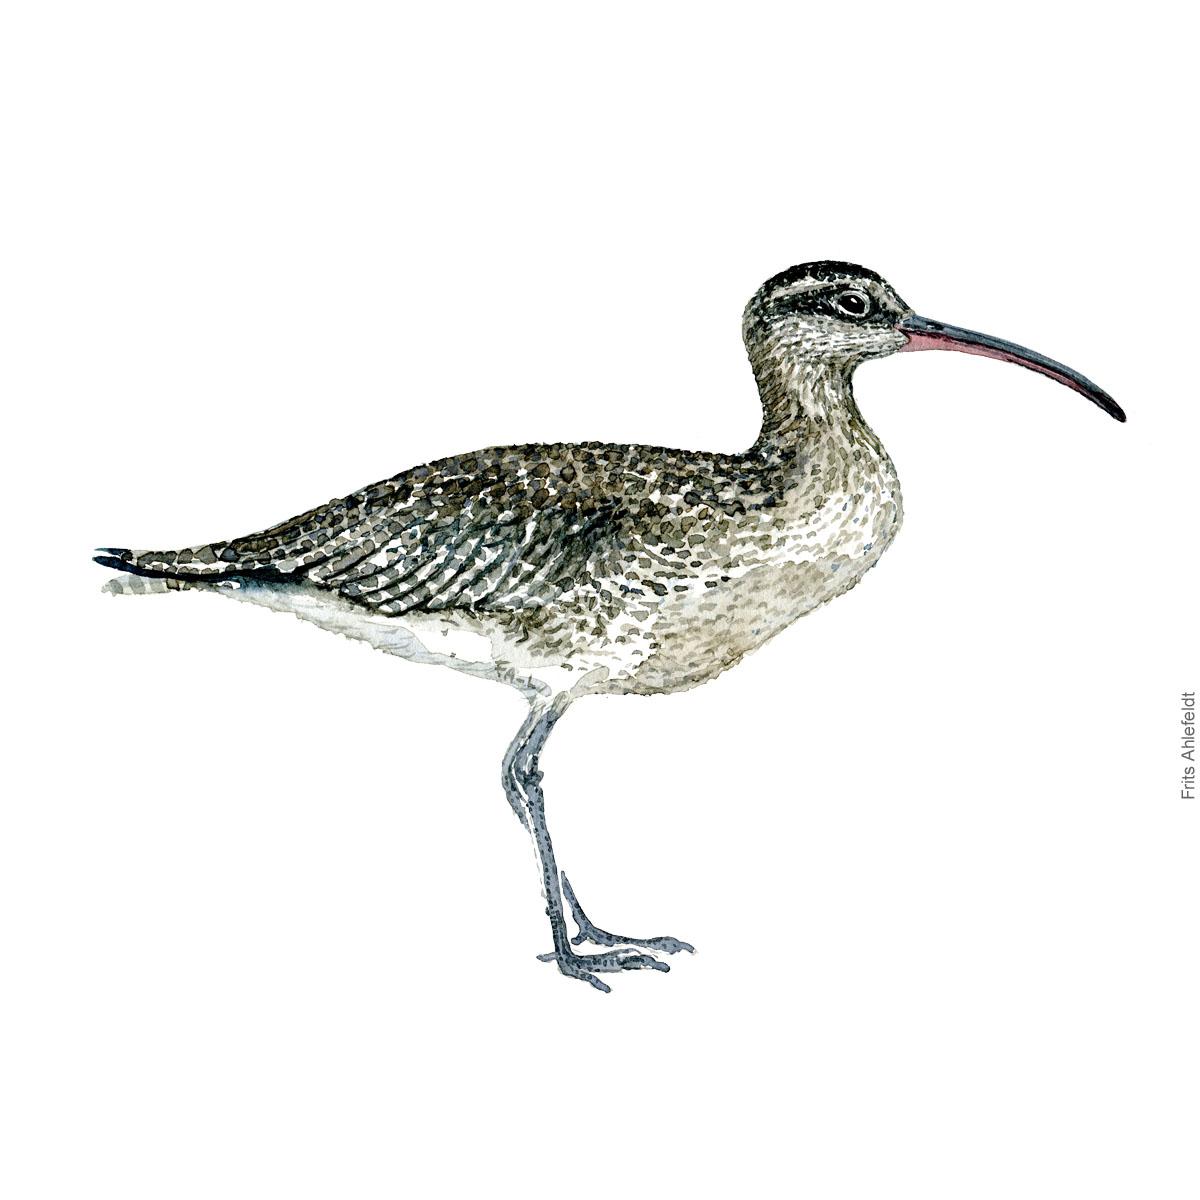 Eurasian curlew. Bird watercolour illustration handmade by Frits Ahlefeldt